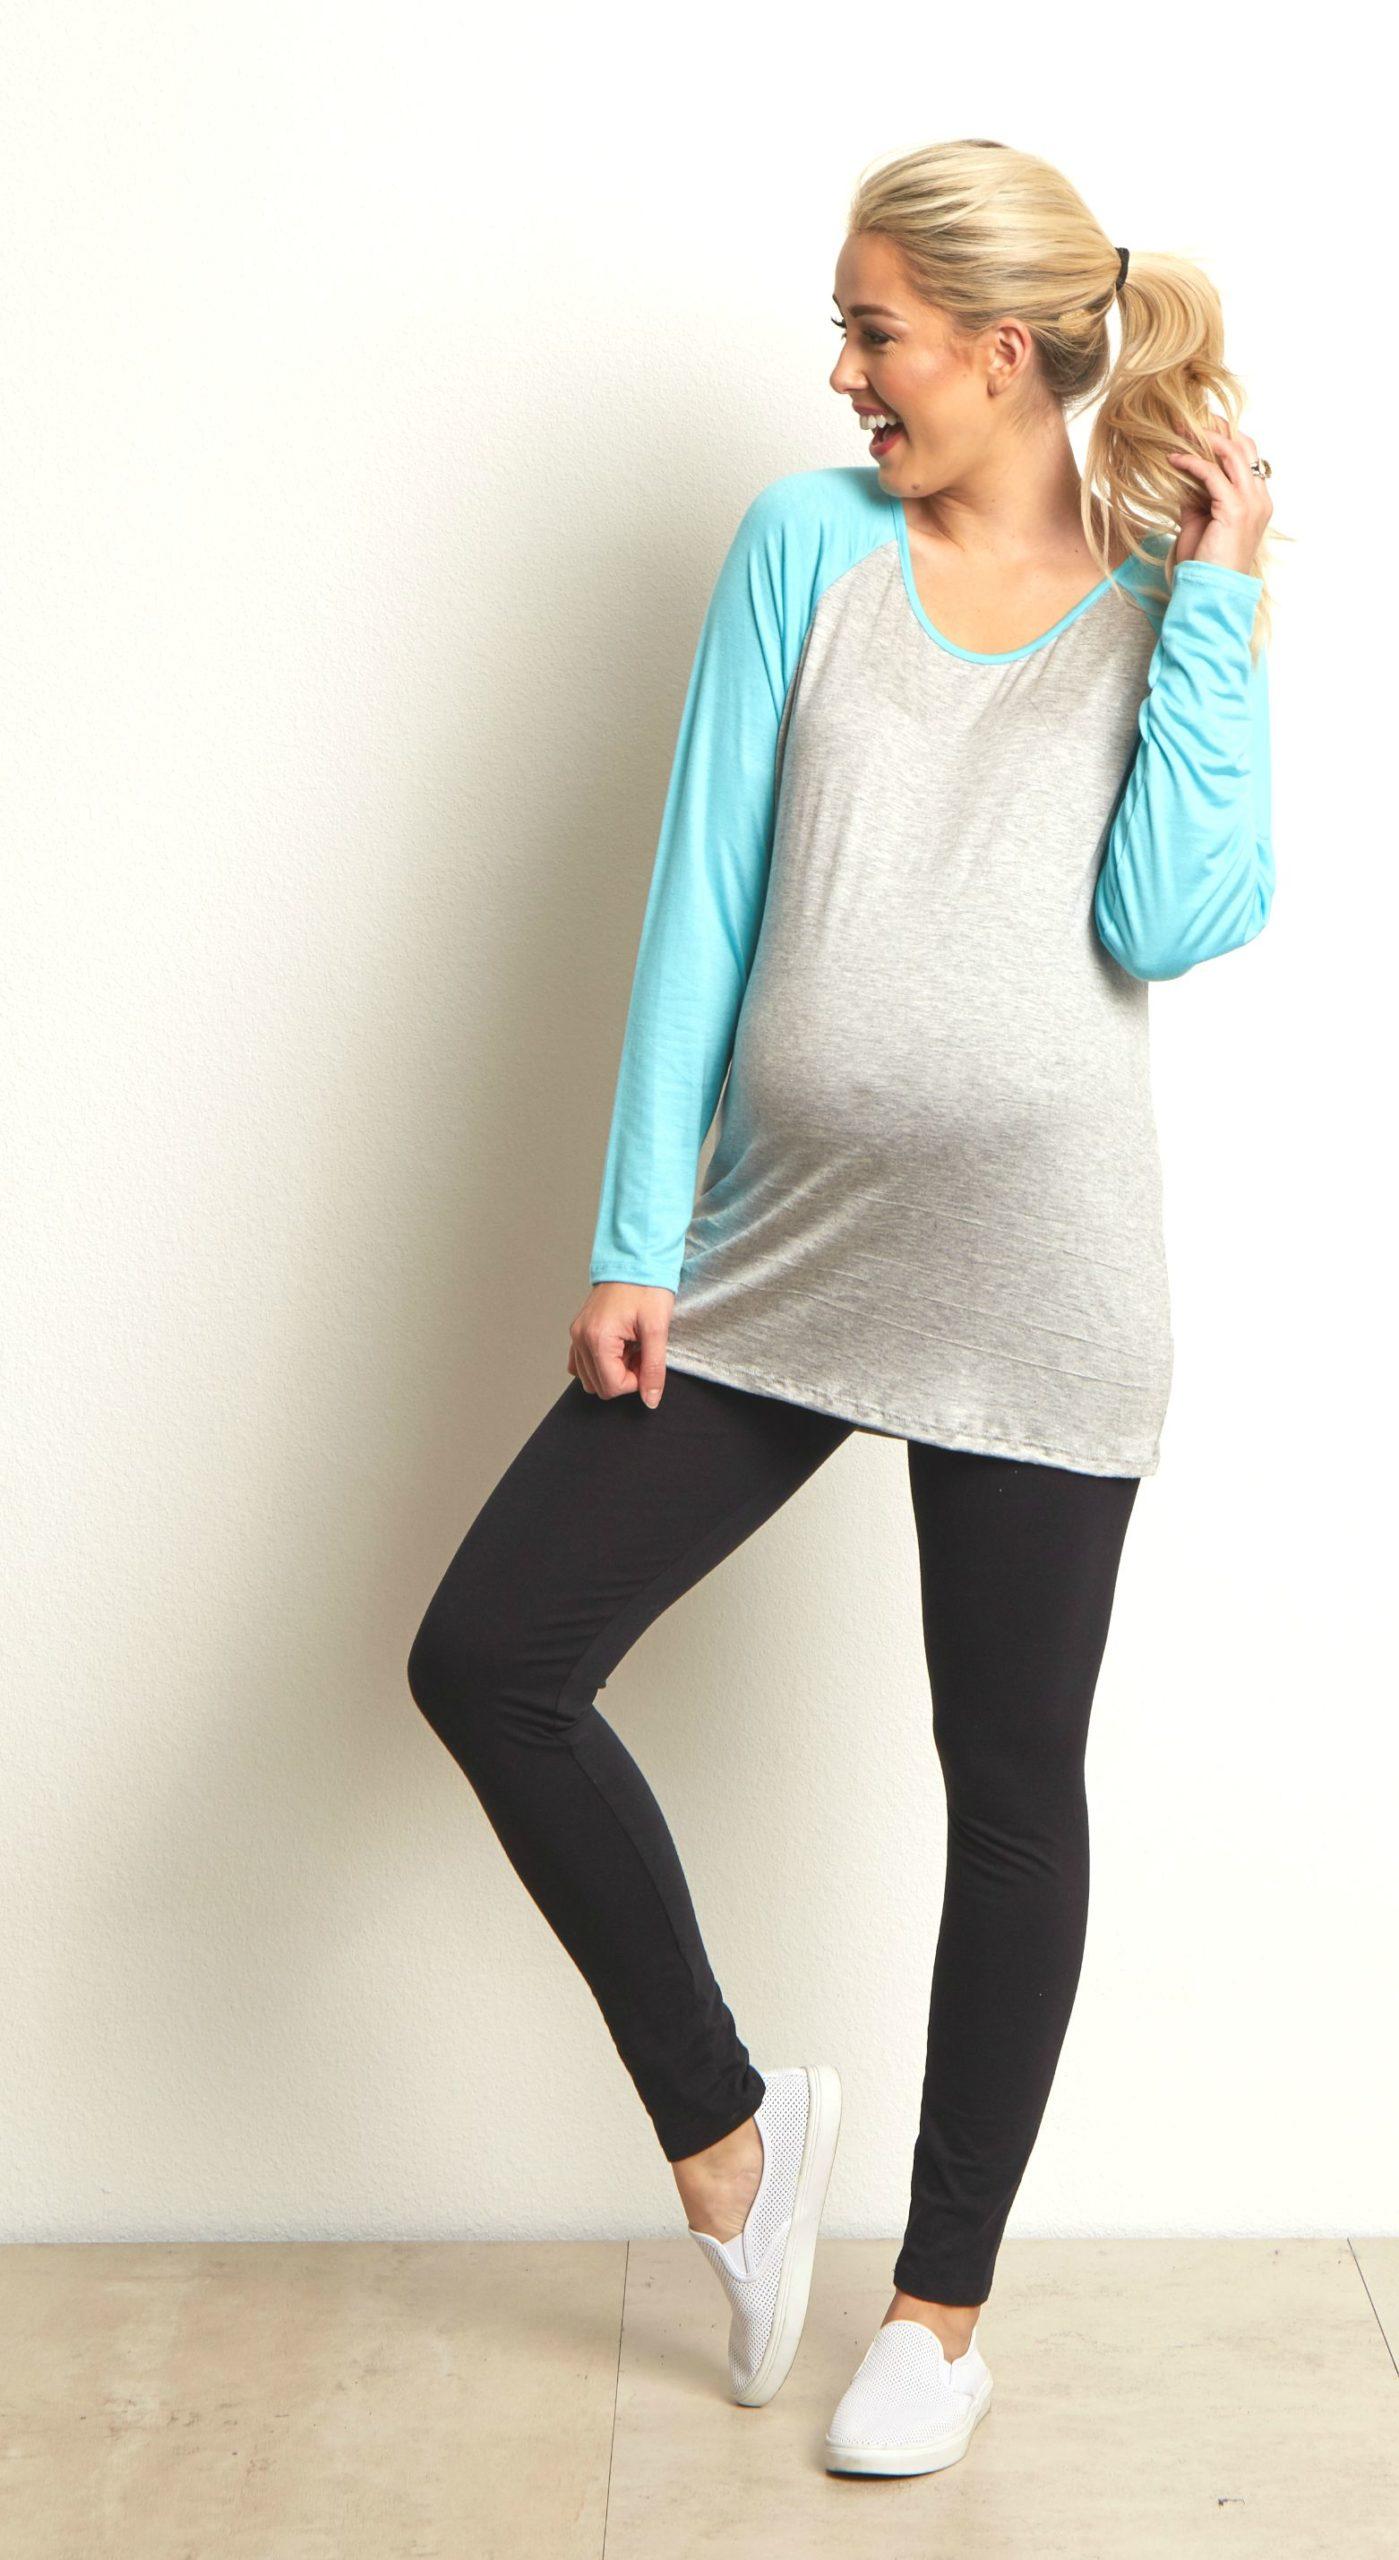 Maternity Pregnancy Top T Shirt